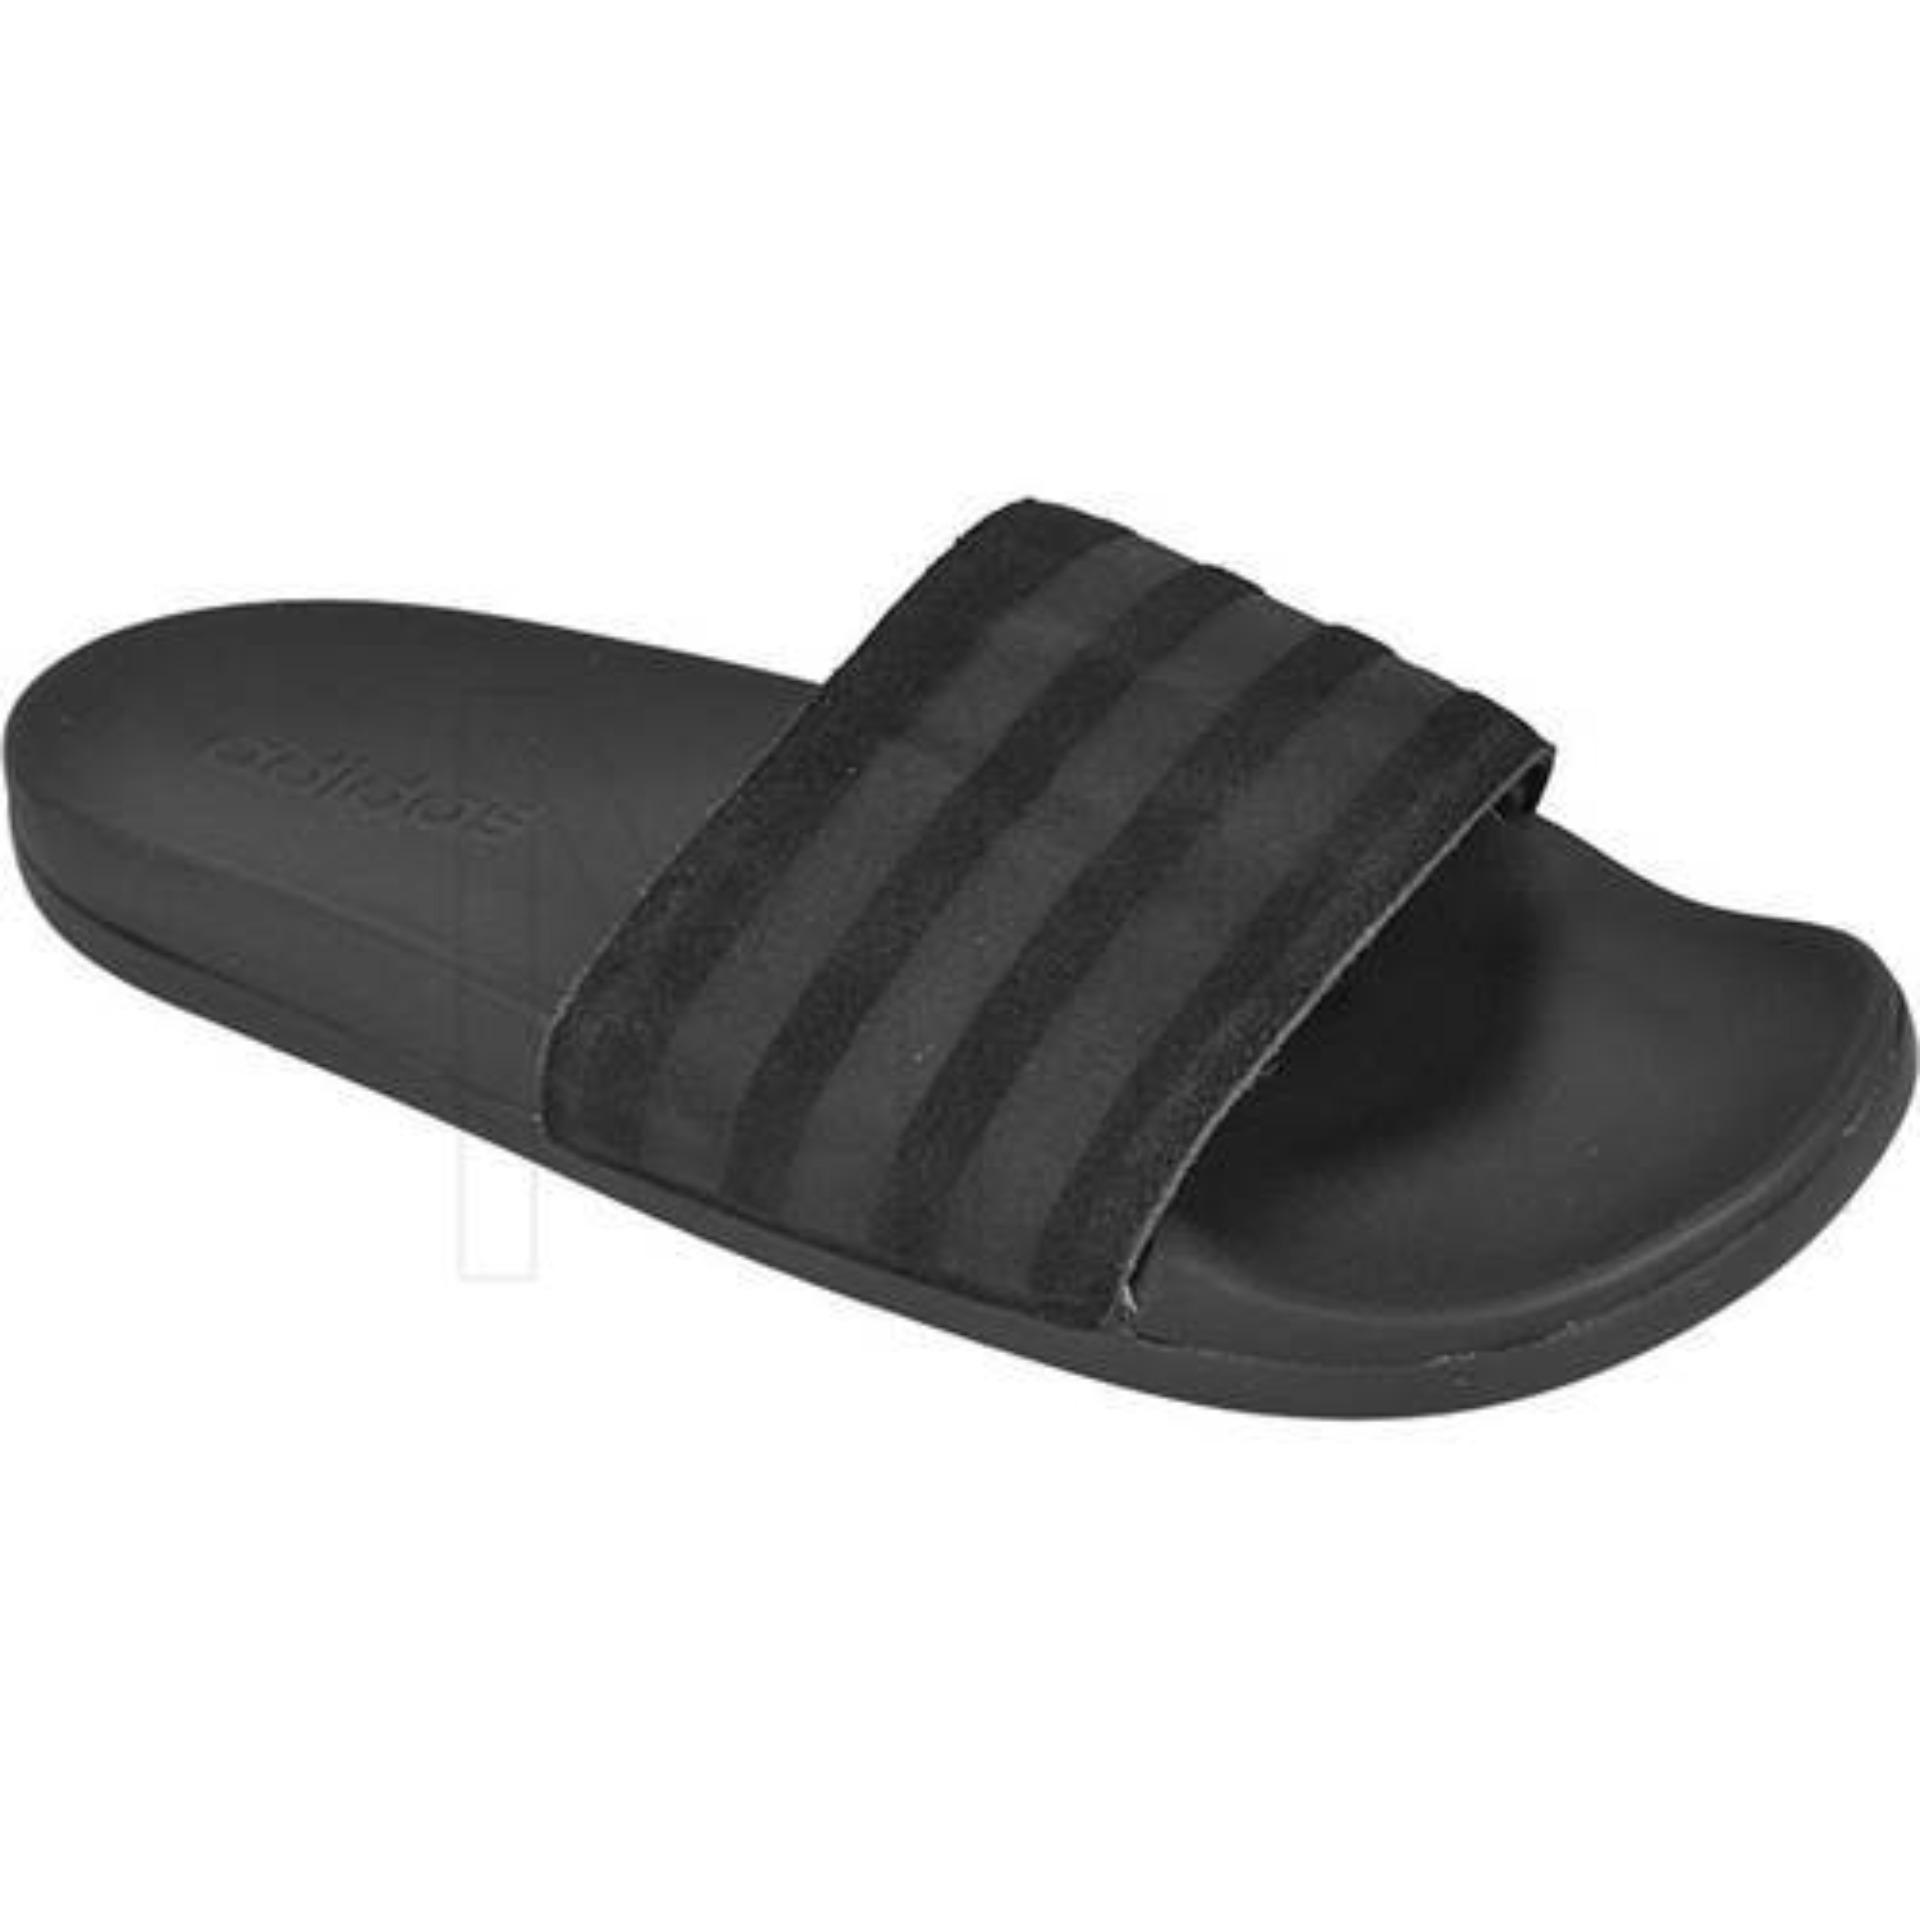 Toko Jual Adidas Sandal Adidas Adilette Cloudfoam Ultra Aq2104